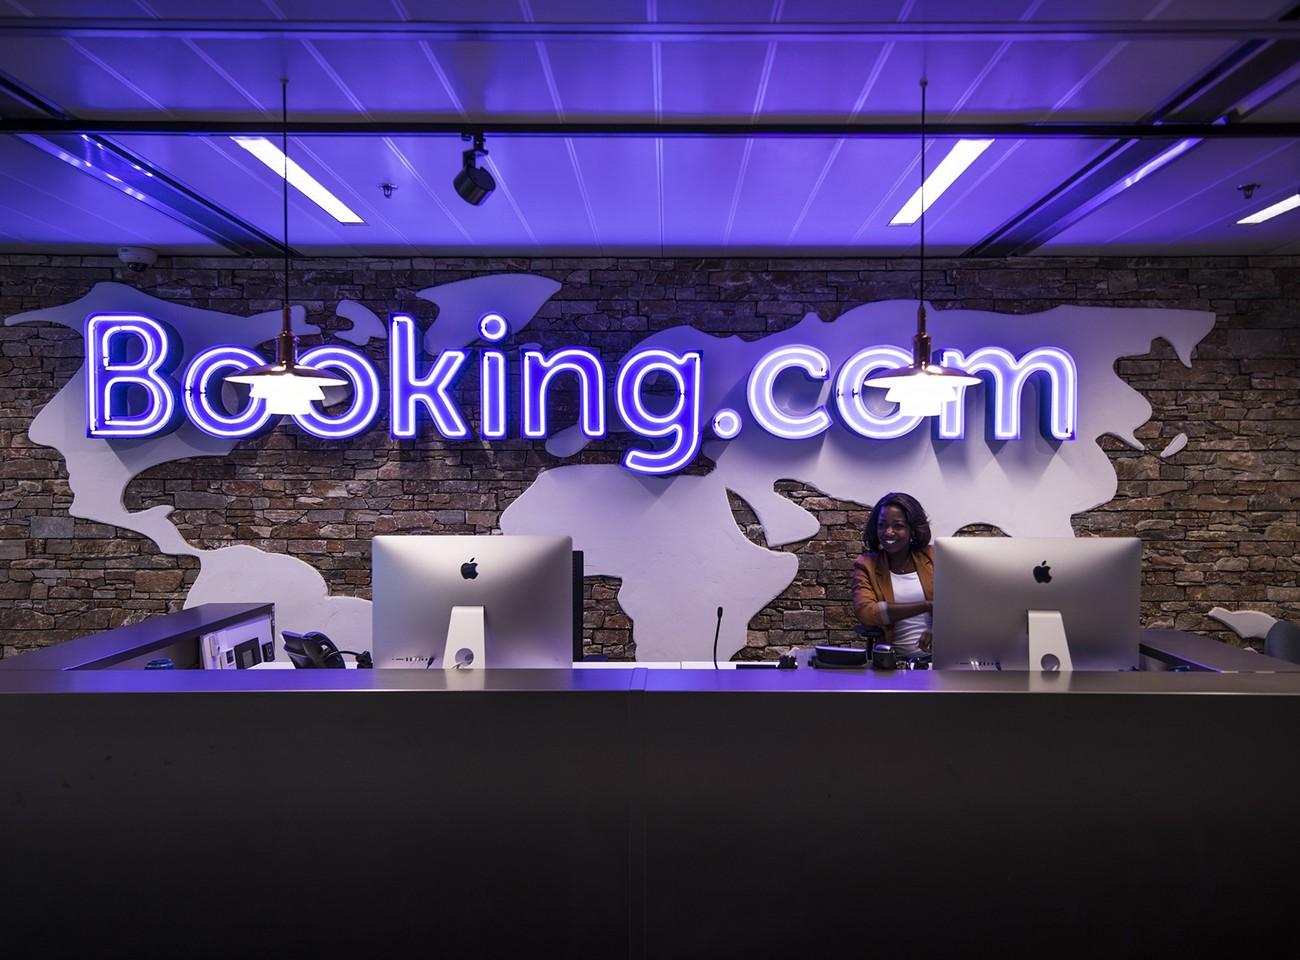 Booking.com Careers